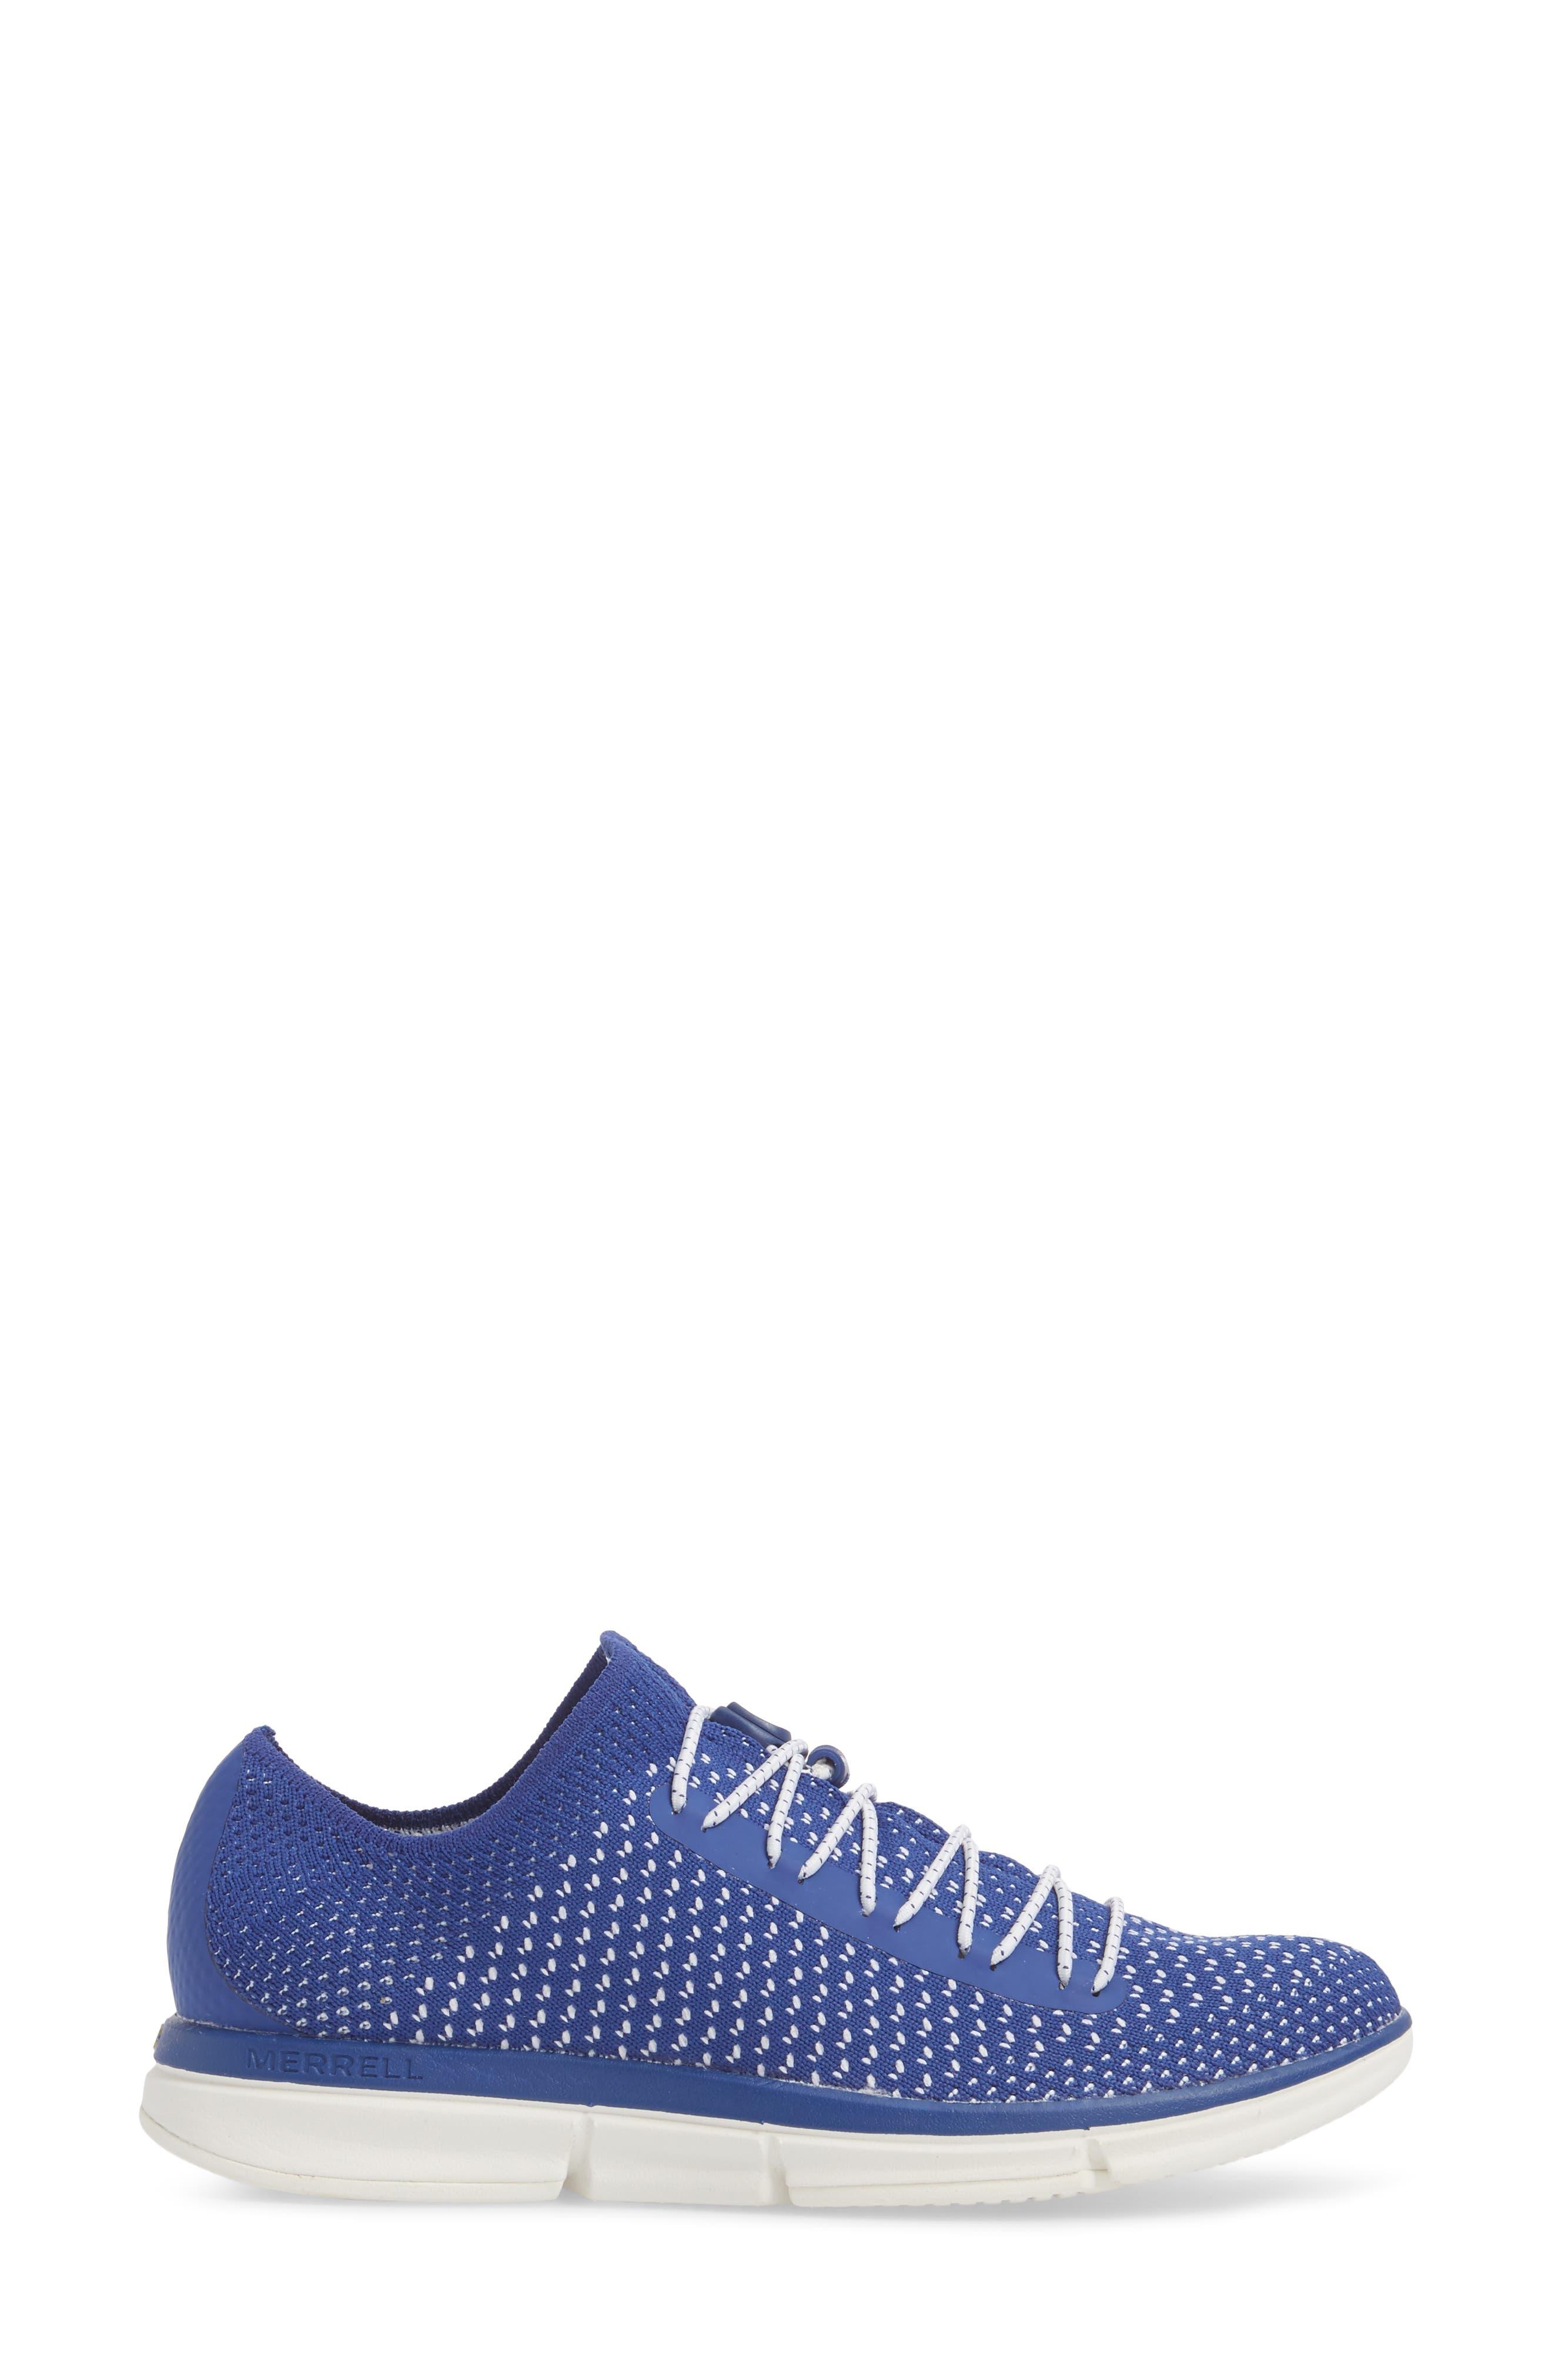 Zoe Sojourn Lace Knit Sneaker,                             Alternate thumbnail 3, color,                             Sodalite